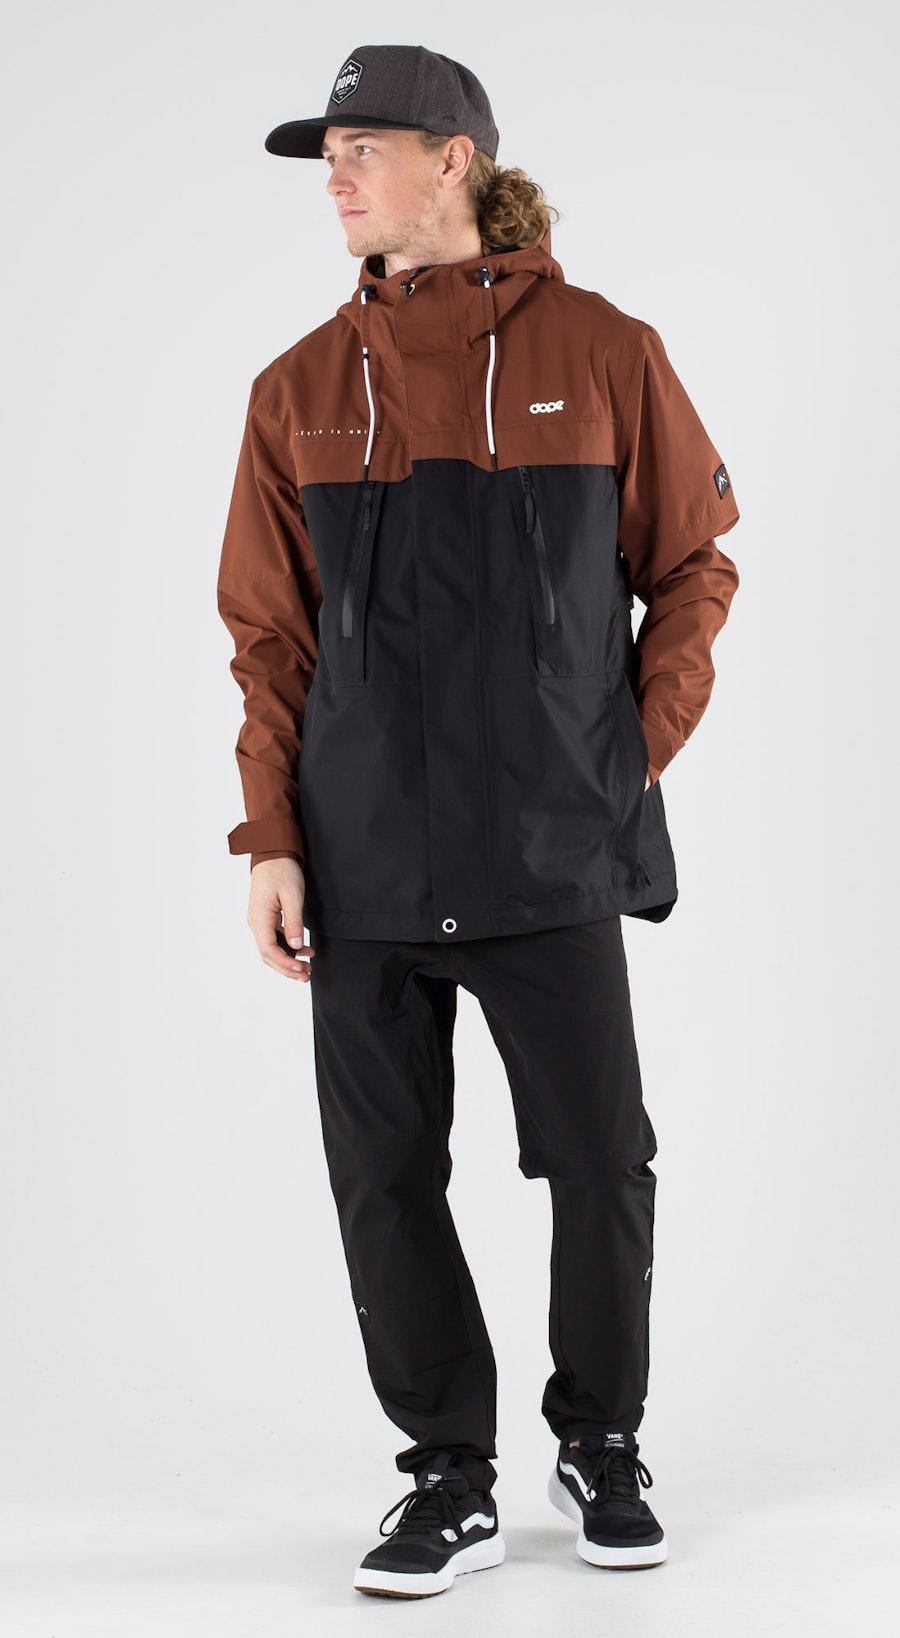 Dope Trekker Adobe Black Outfit Multi